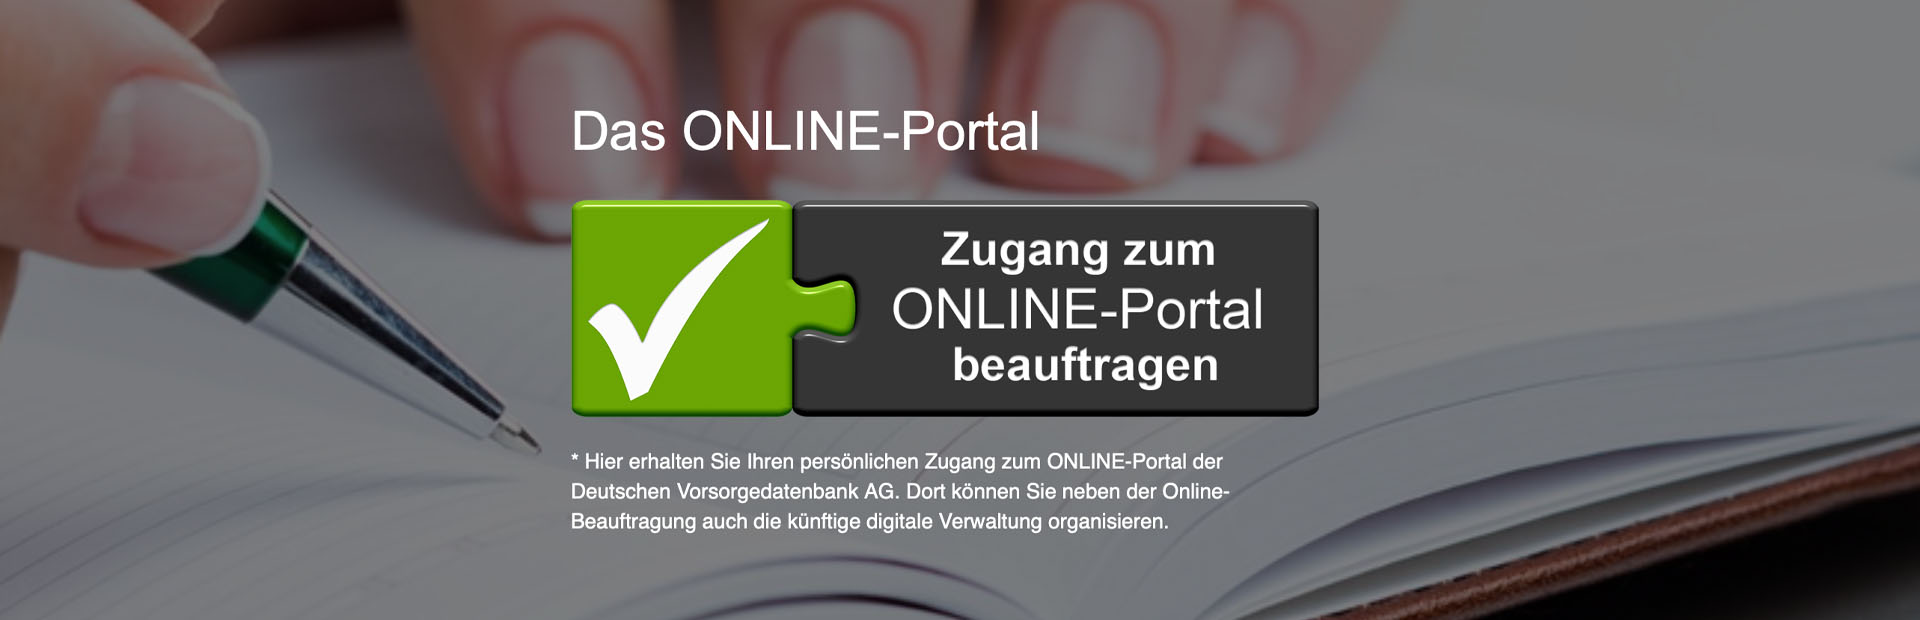 Das Online-PREMIUM-Portal